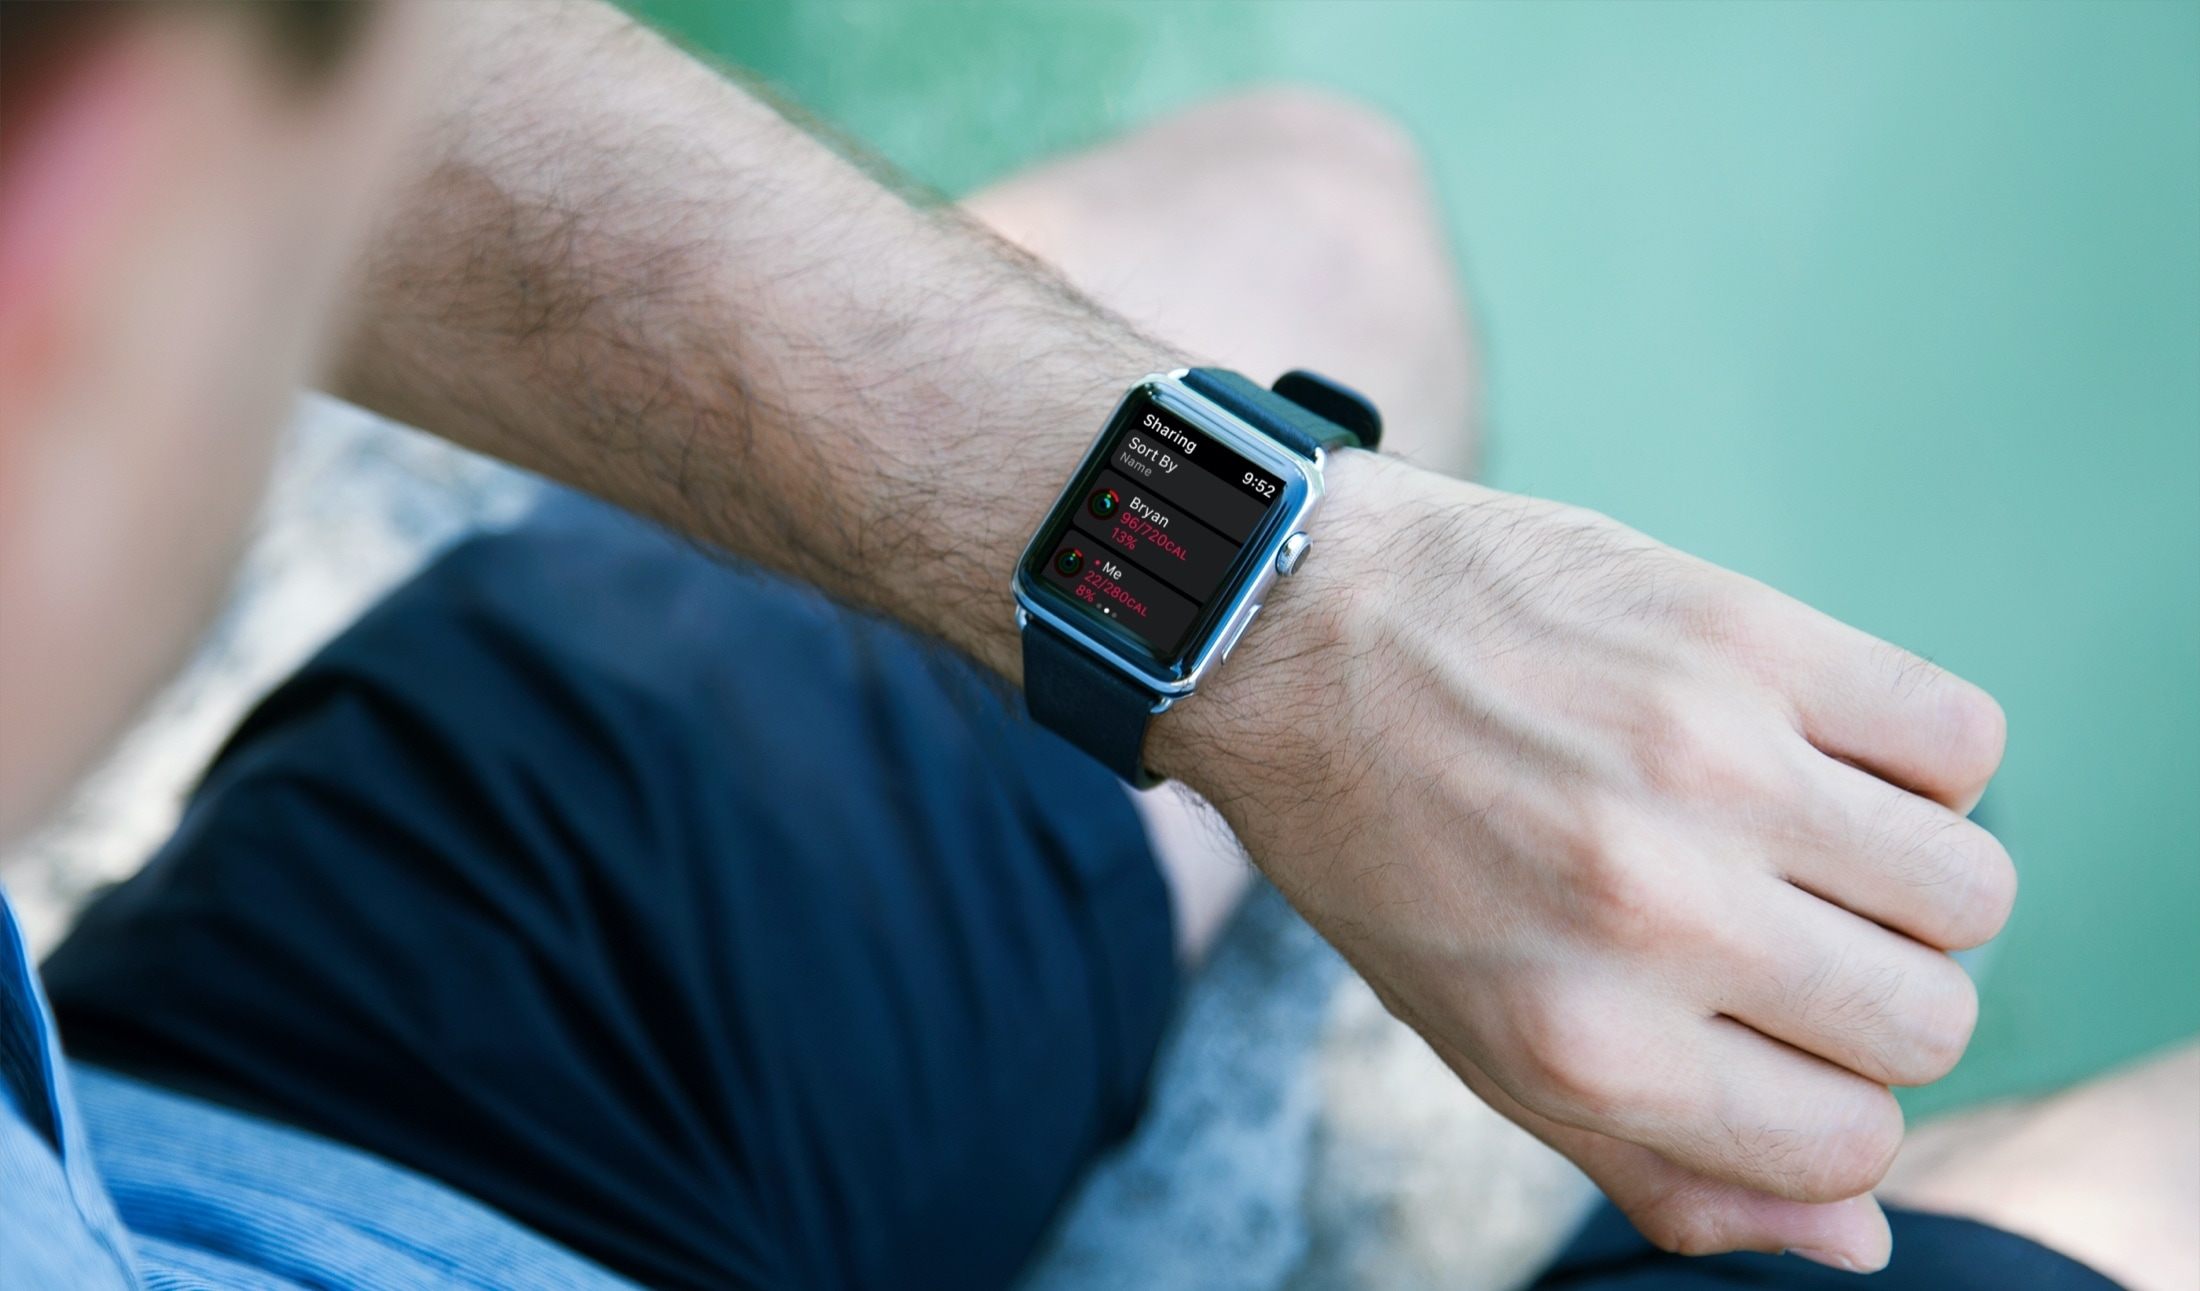 Activity Sharing on Apple Watch